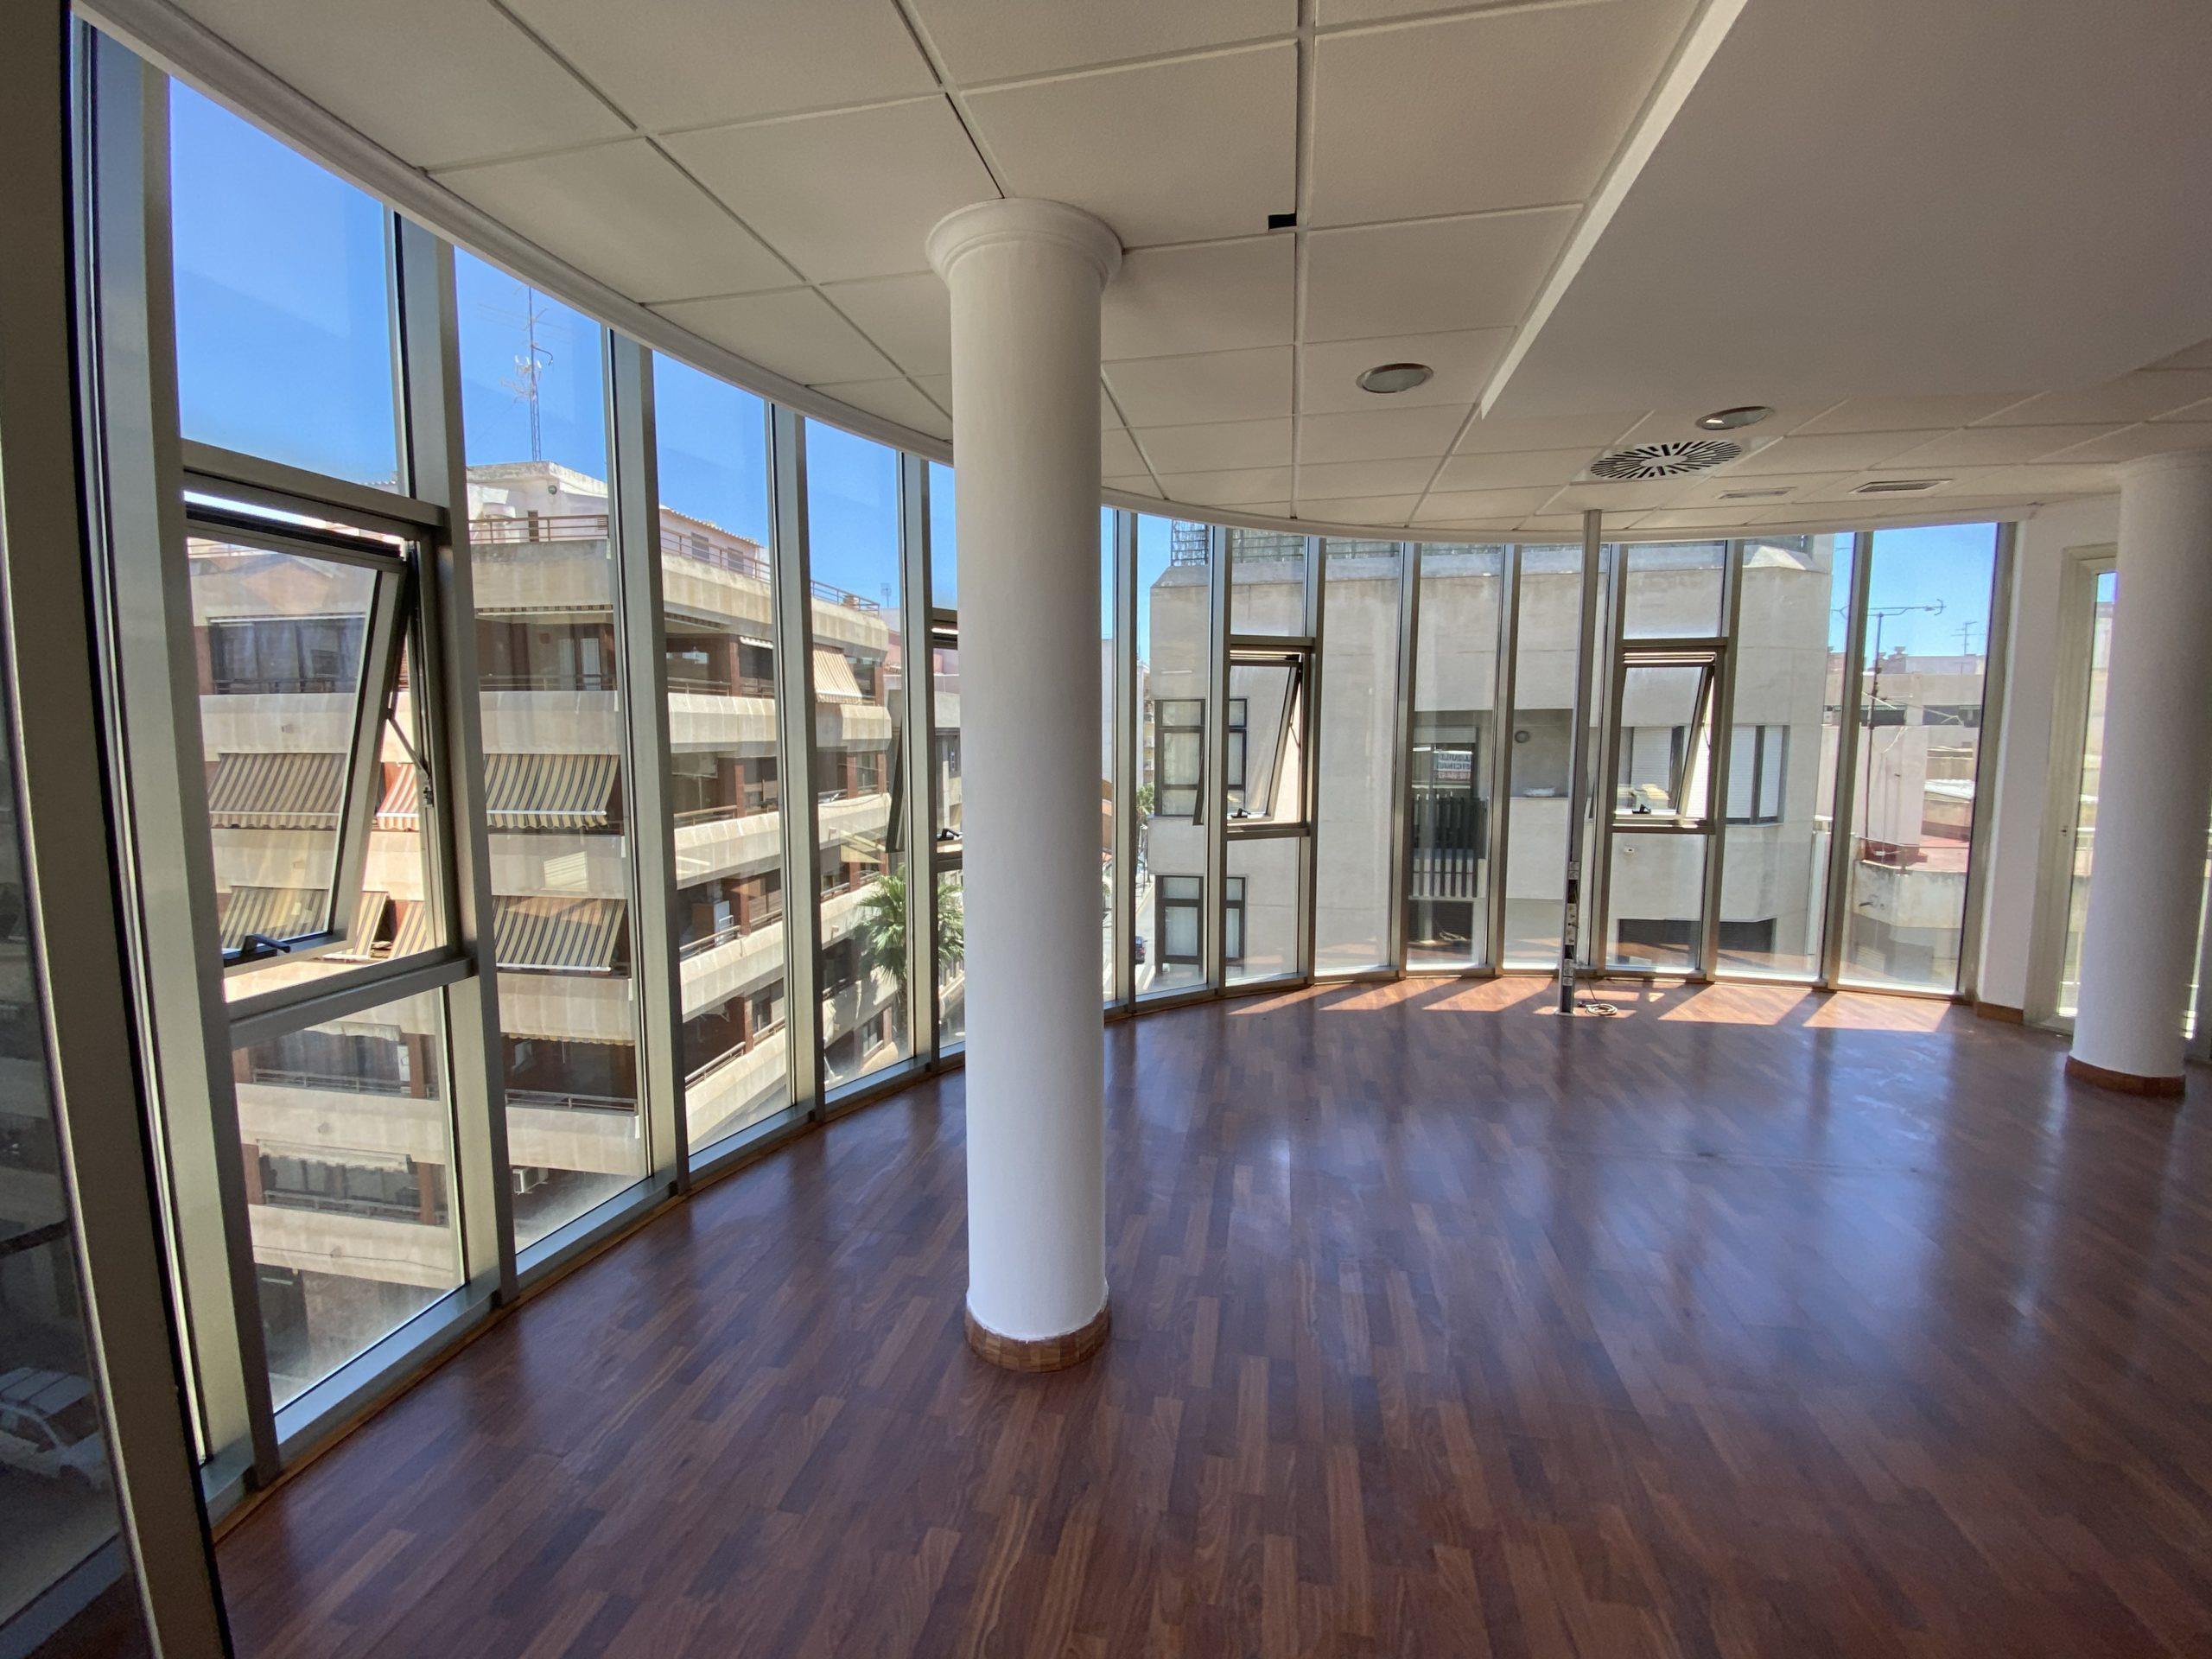 Alquiler local para oficinas en Torrevieja